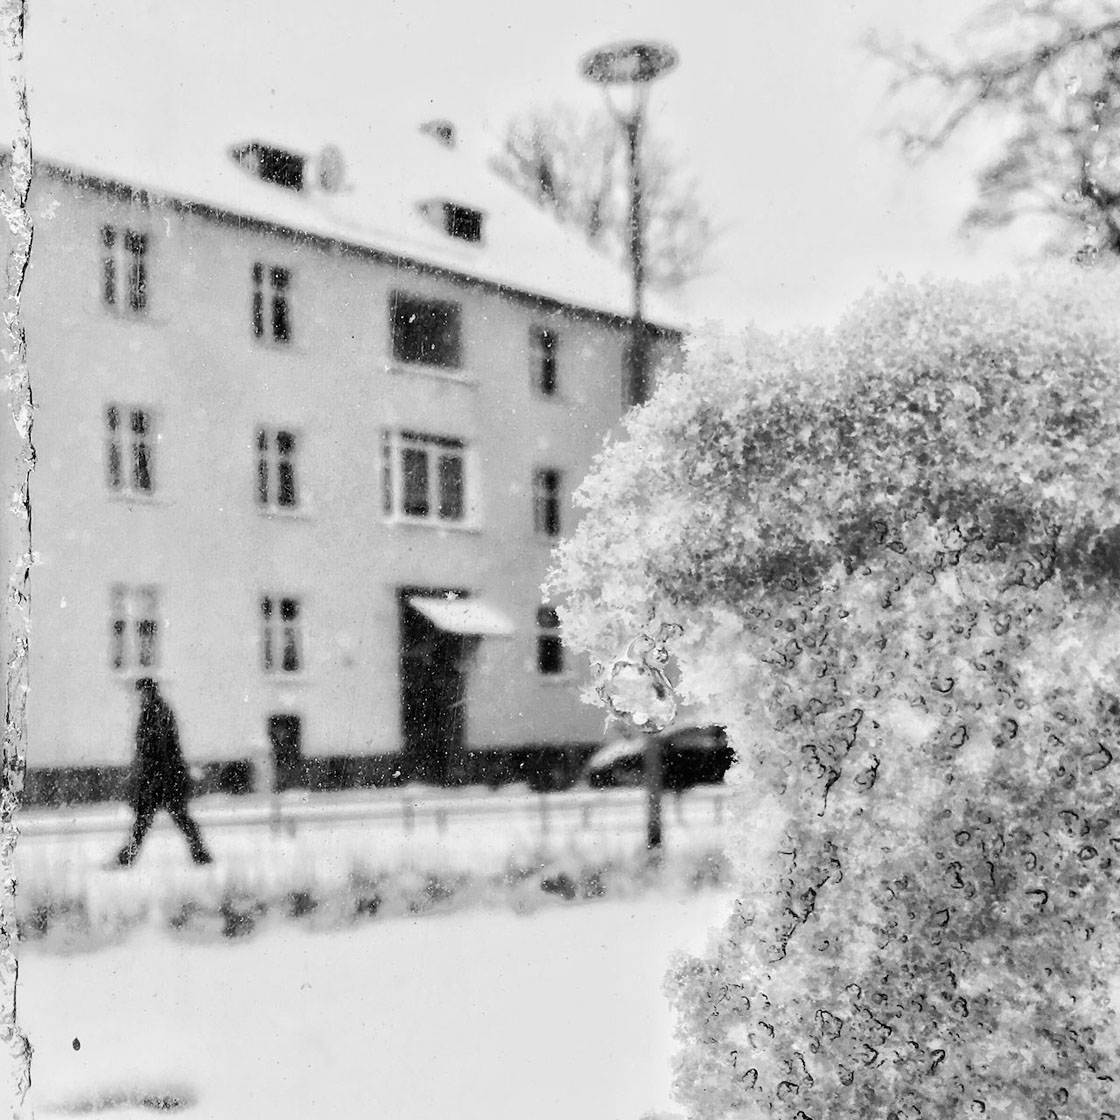 Winter iPhone Photos 2016 1 no script